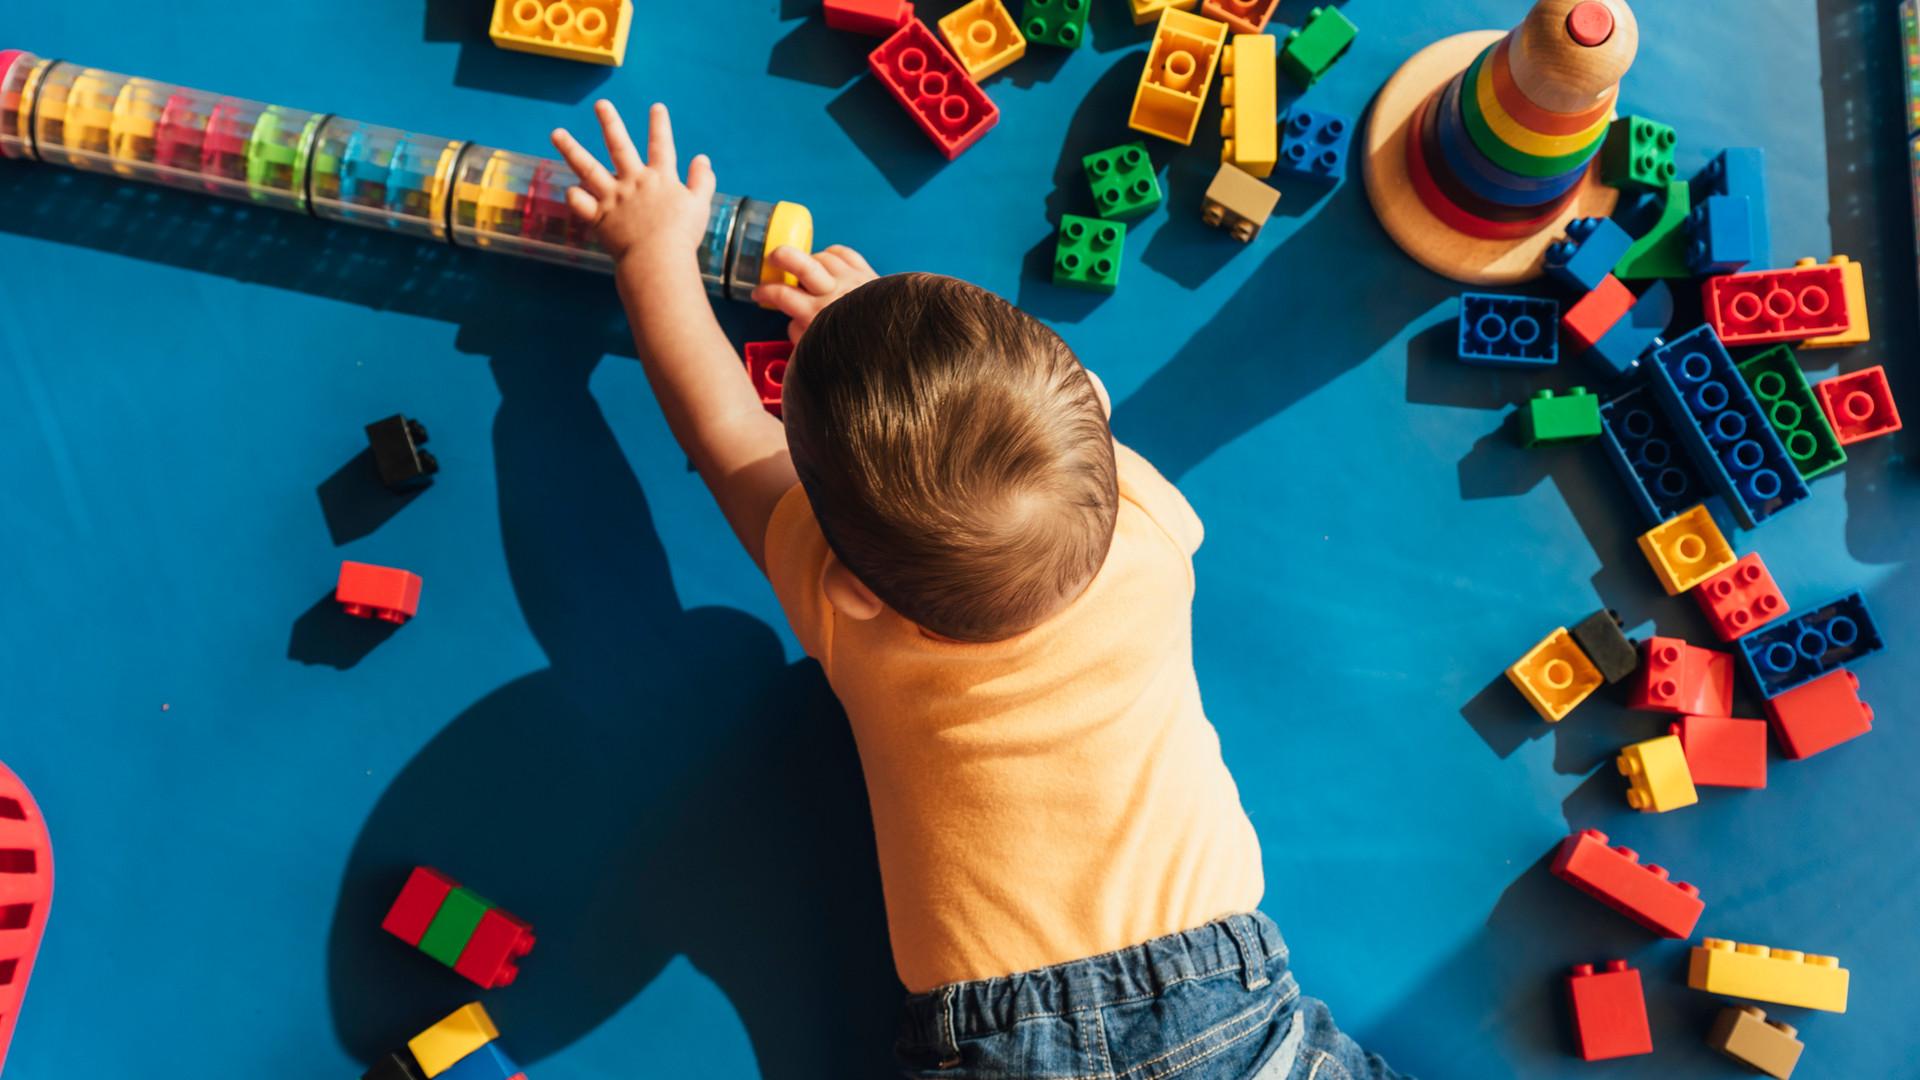 happy-baby-playing-with-toy-blocks-FZ5YQ